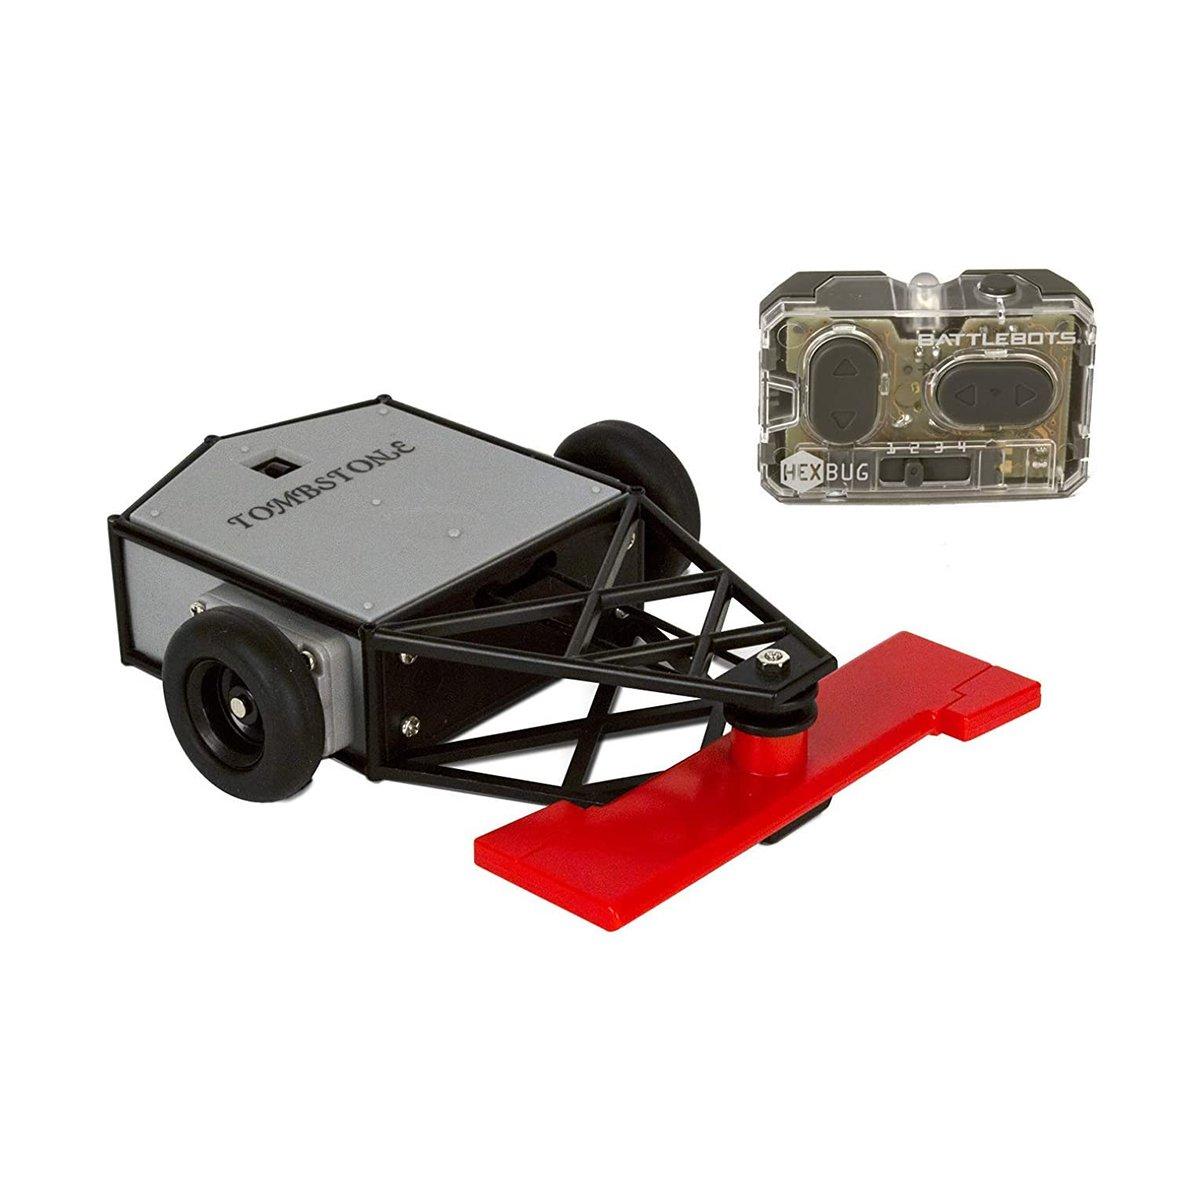 Robot de lupta cu telecomanda BattleBots Hexbug, Tombstone, 413-5185